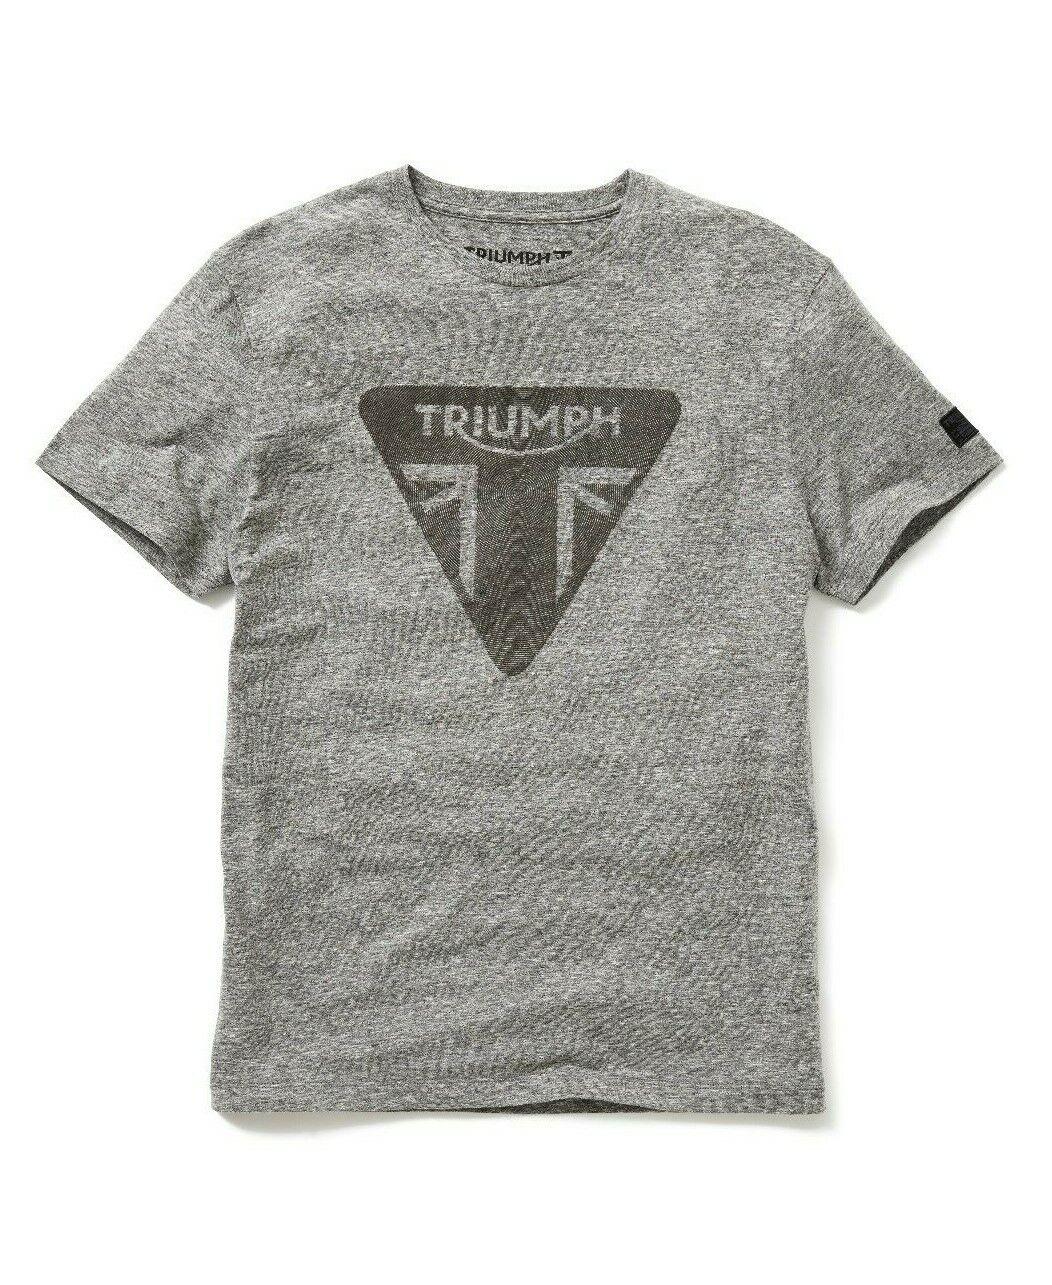 Triumph Motorcycles Roaring Tee Mens Grey Logo T-Shirt NEW MTSS19302